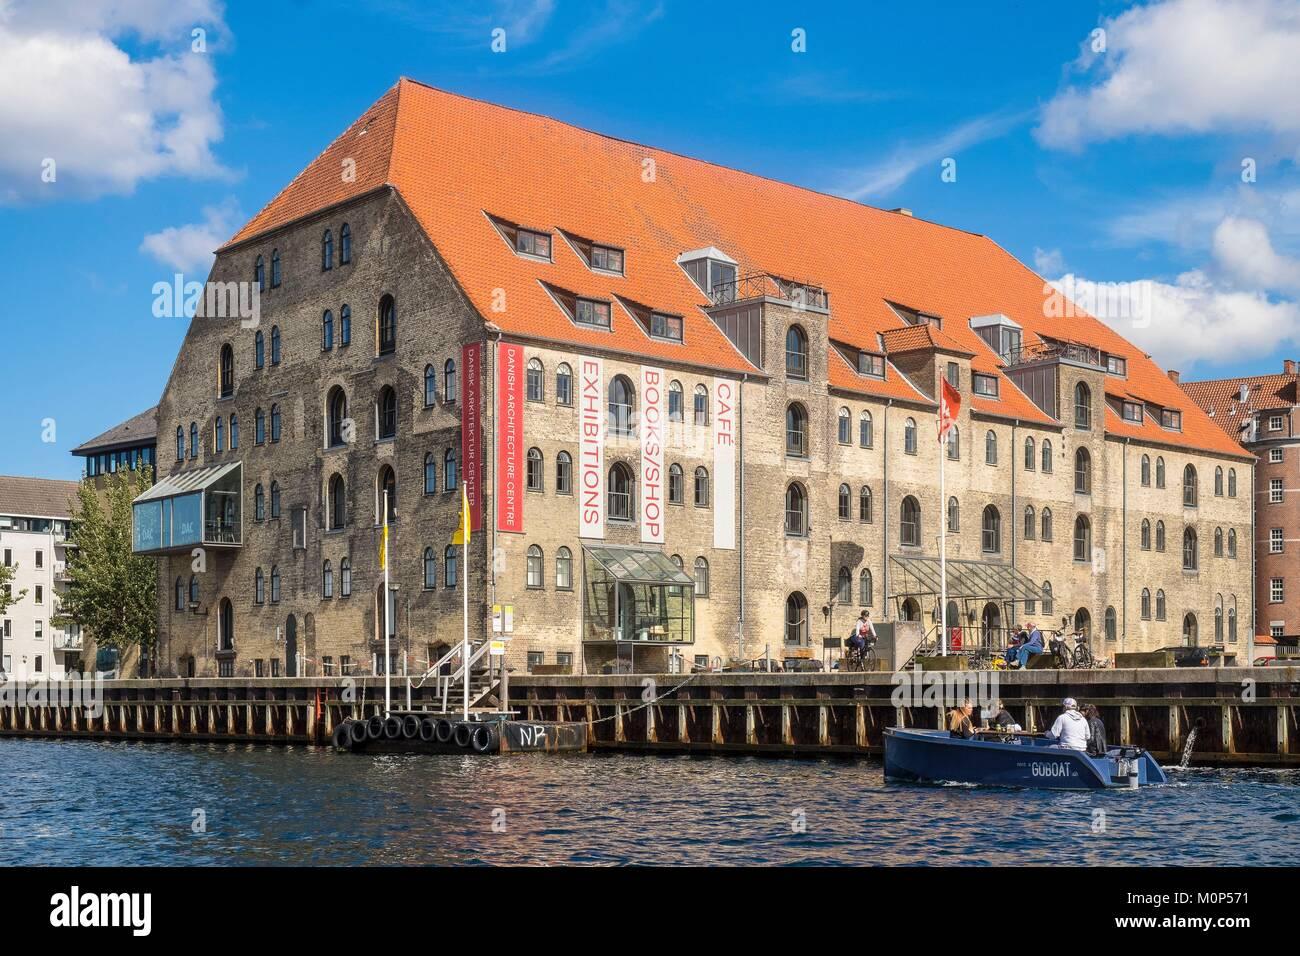 Denmark,Zealand,Copenhagen,Danish architectural centre - Stock Image